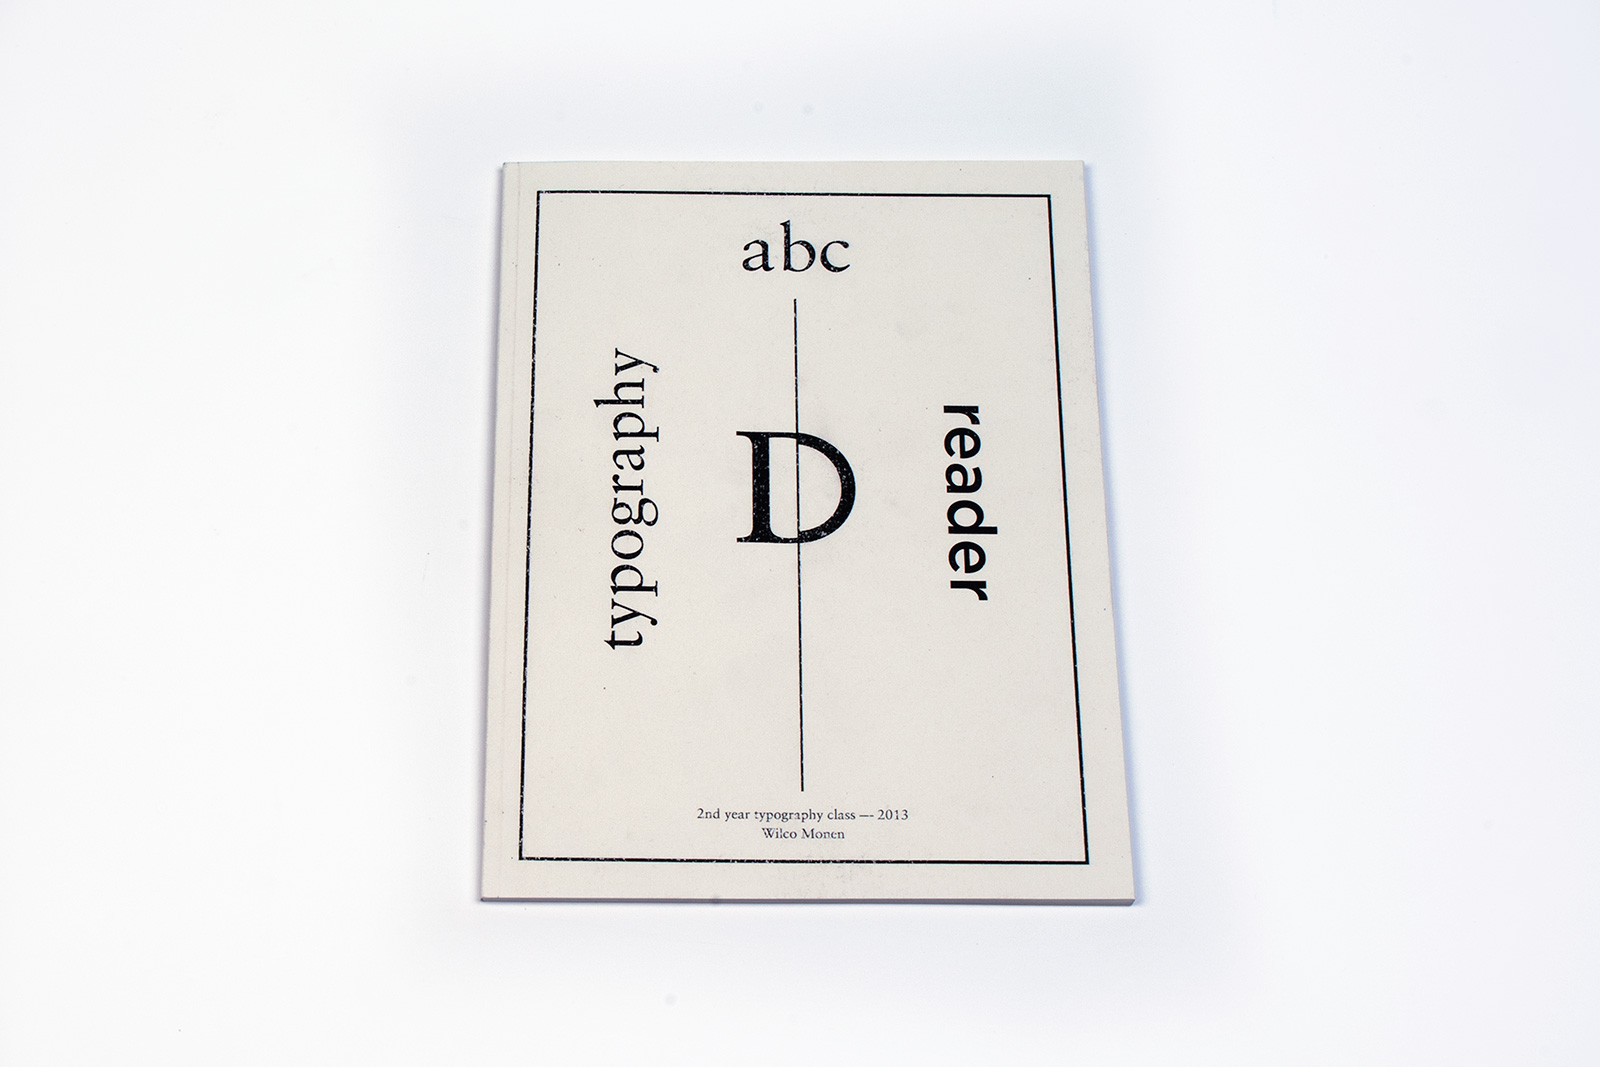 abc-typographic-reader-book-wilco-monen-01.jpg